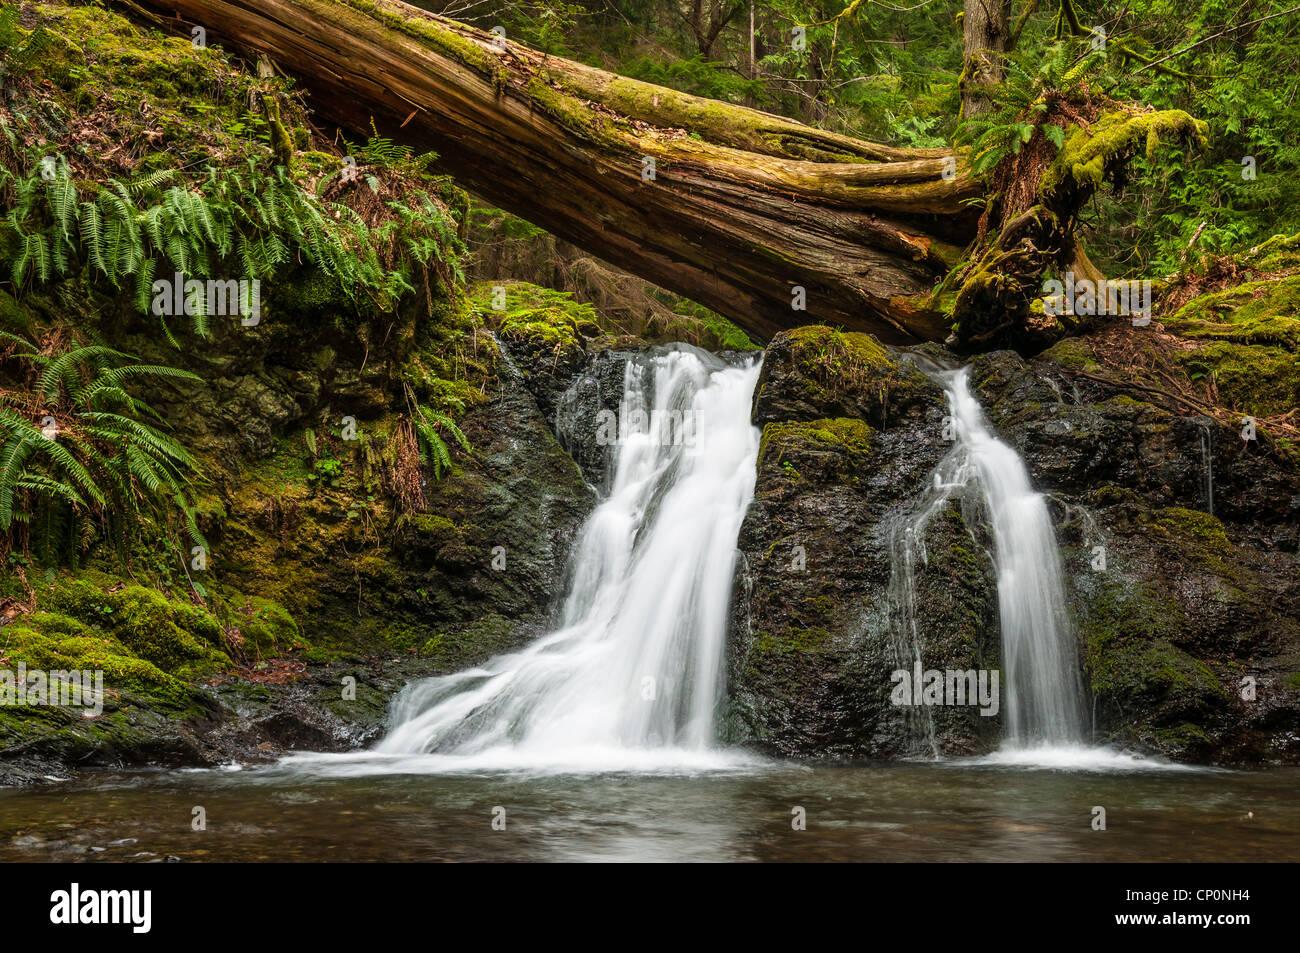 Rustikal-Fälle, Moran Staatspark, Orcas Island; San Juan Islands, Washington. Stockbild